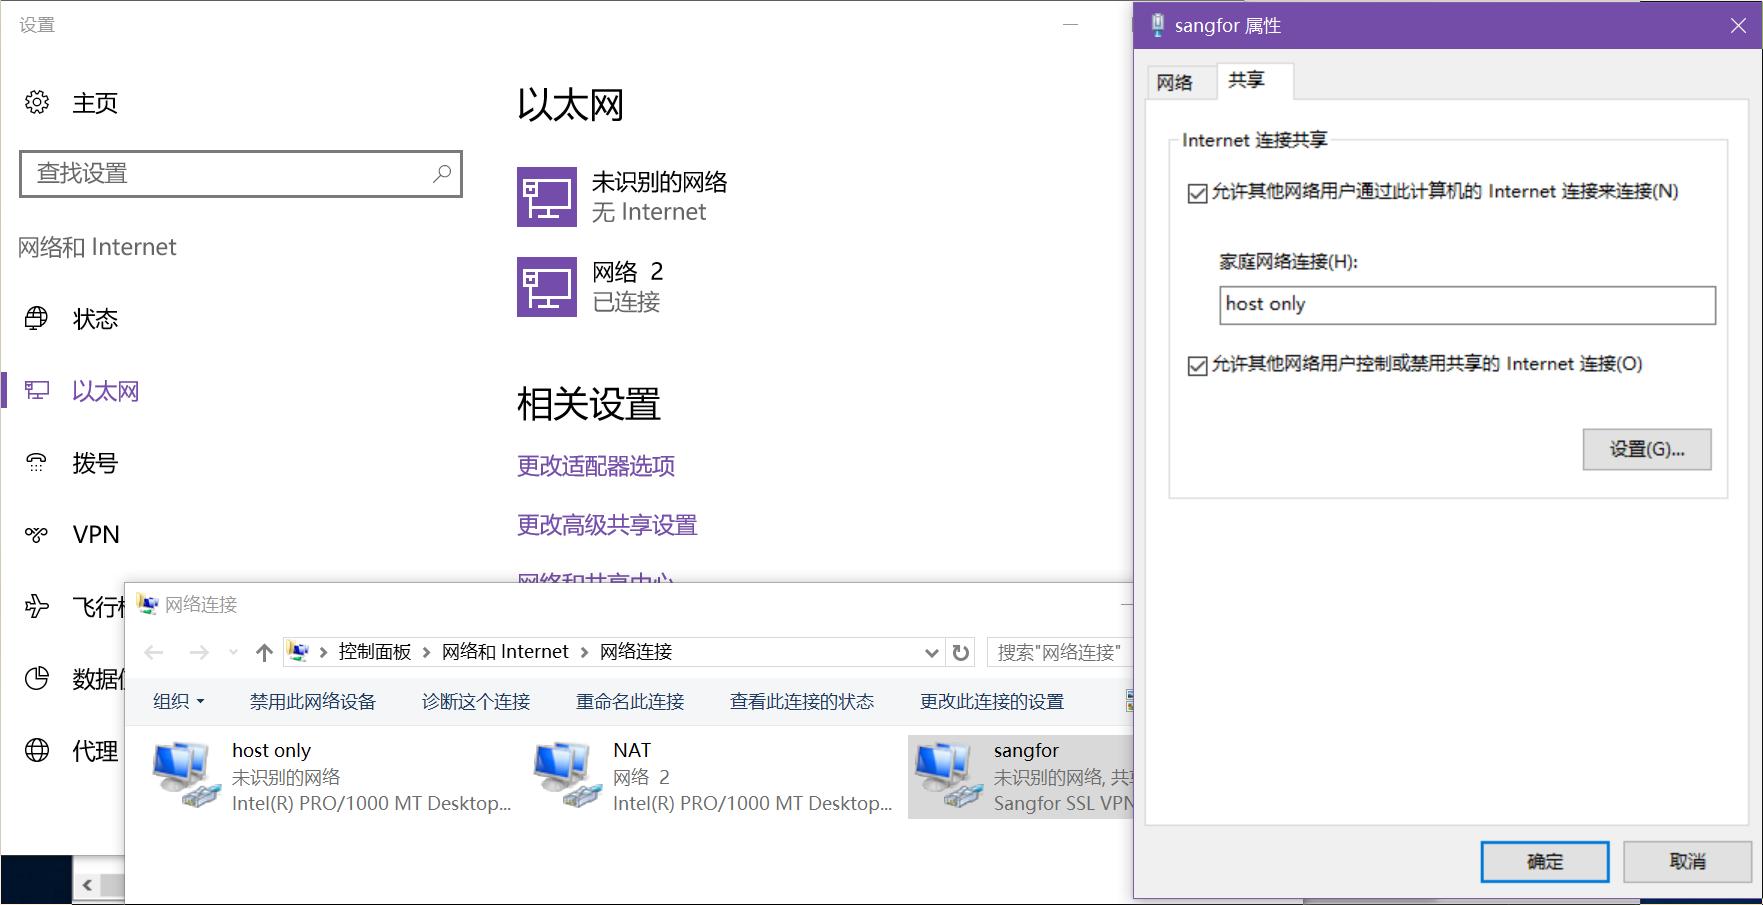 Windows 10 中配置网络共享